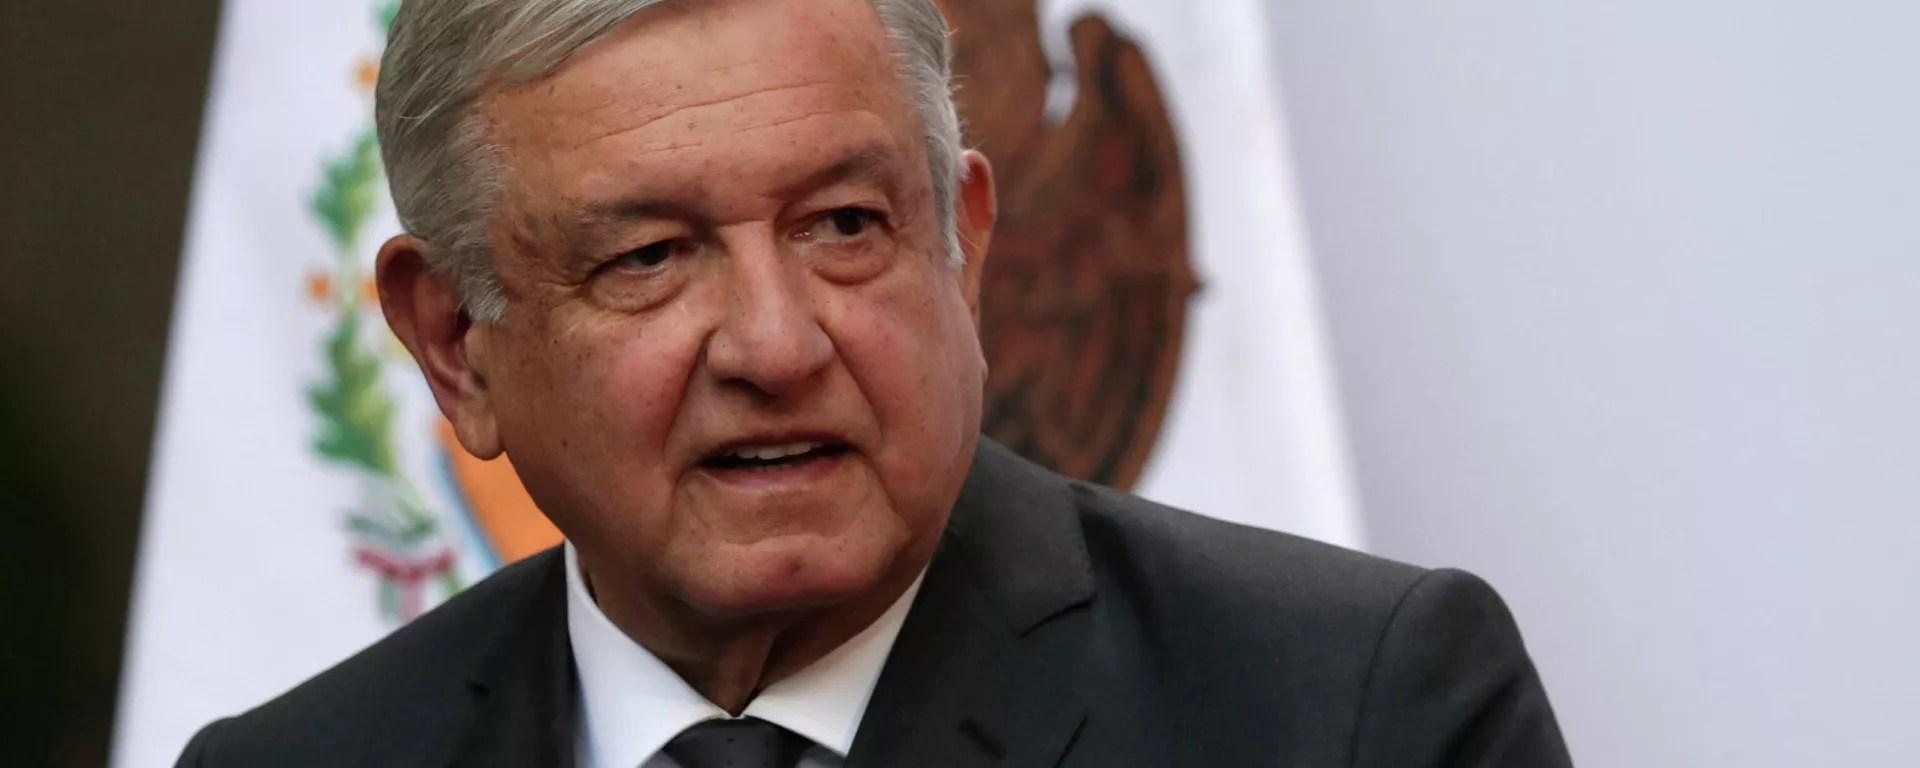 El presidente de México, Andrés Manuel López Obrador - Sputnik Mundo, 1920, 06.09.2021